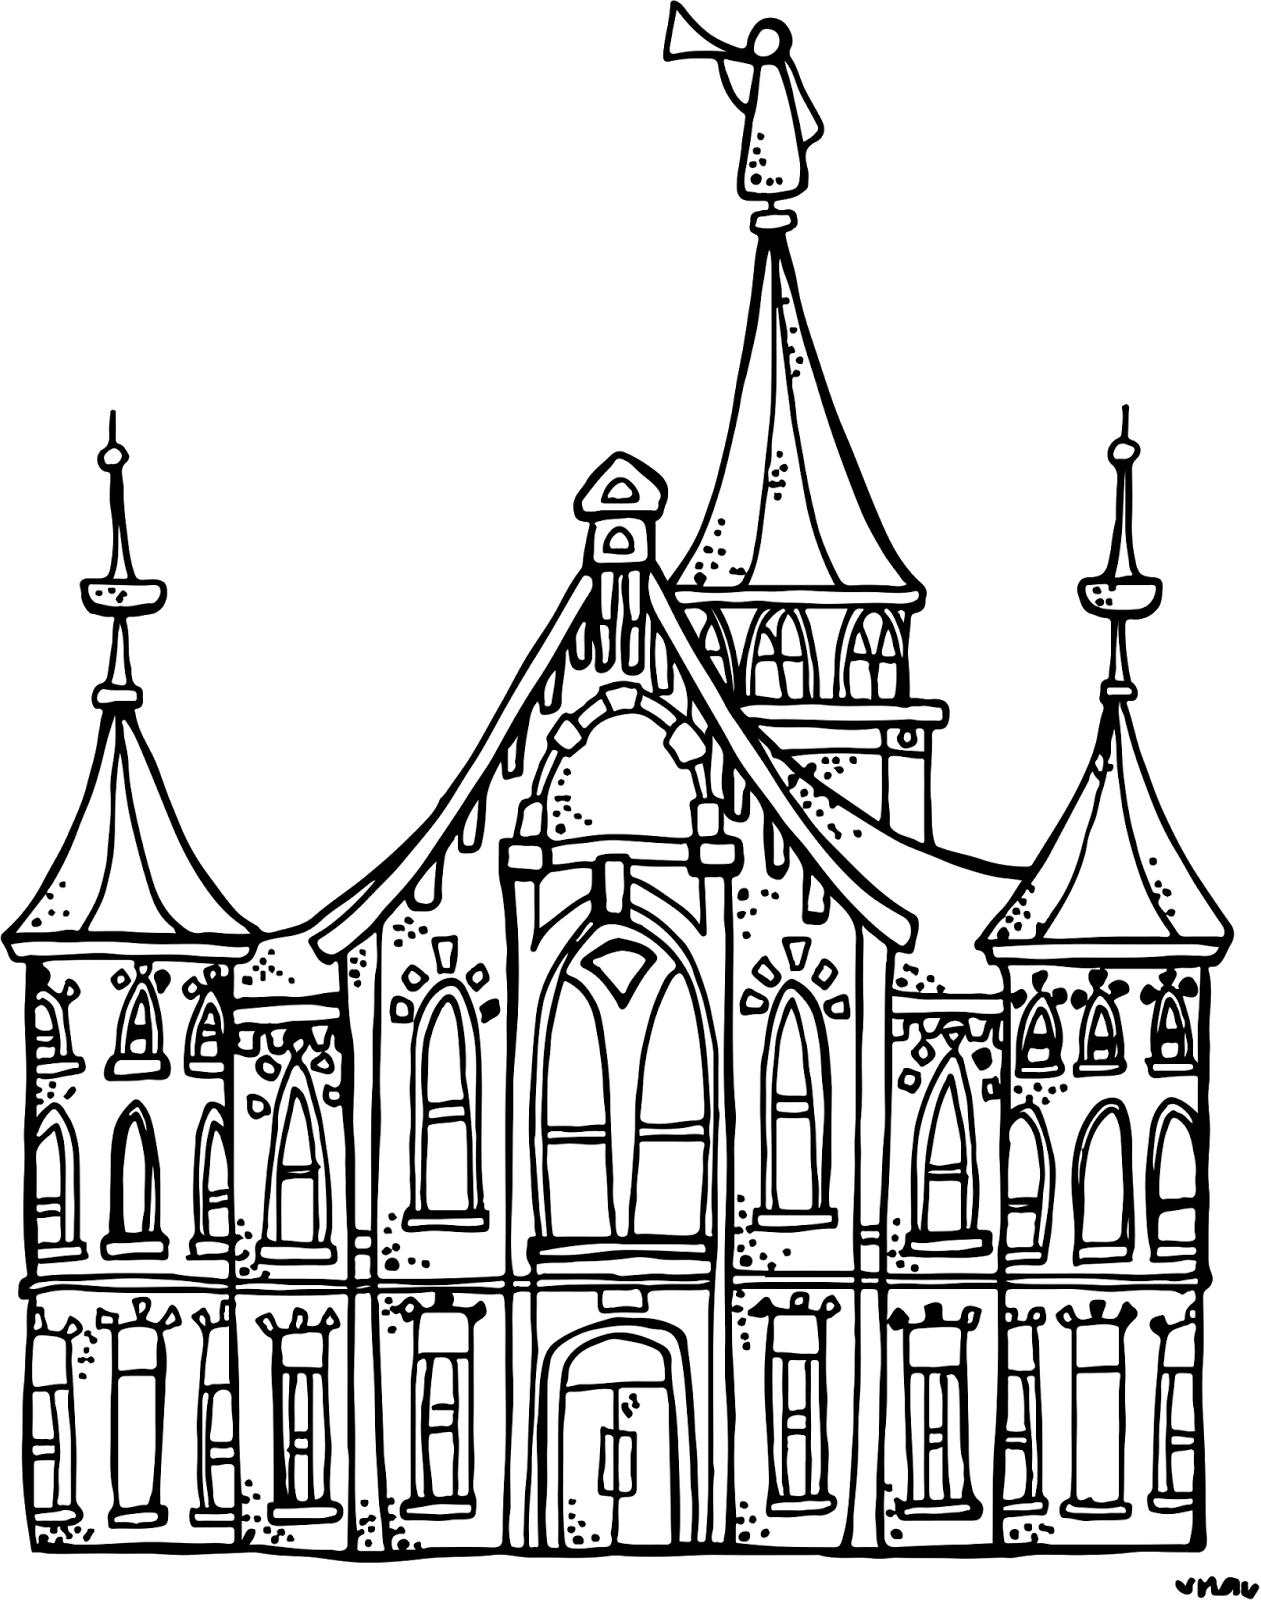 Melonheadz Lds Illustrating Provo City Center Temple